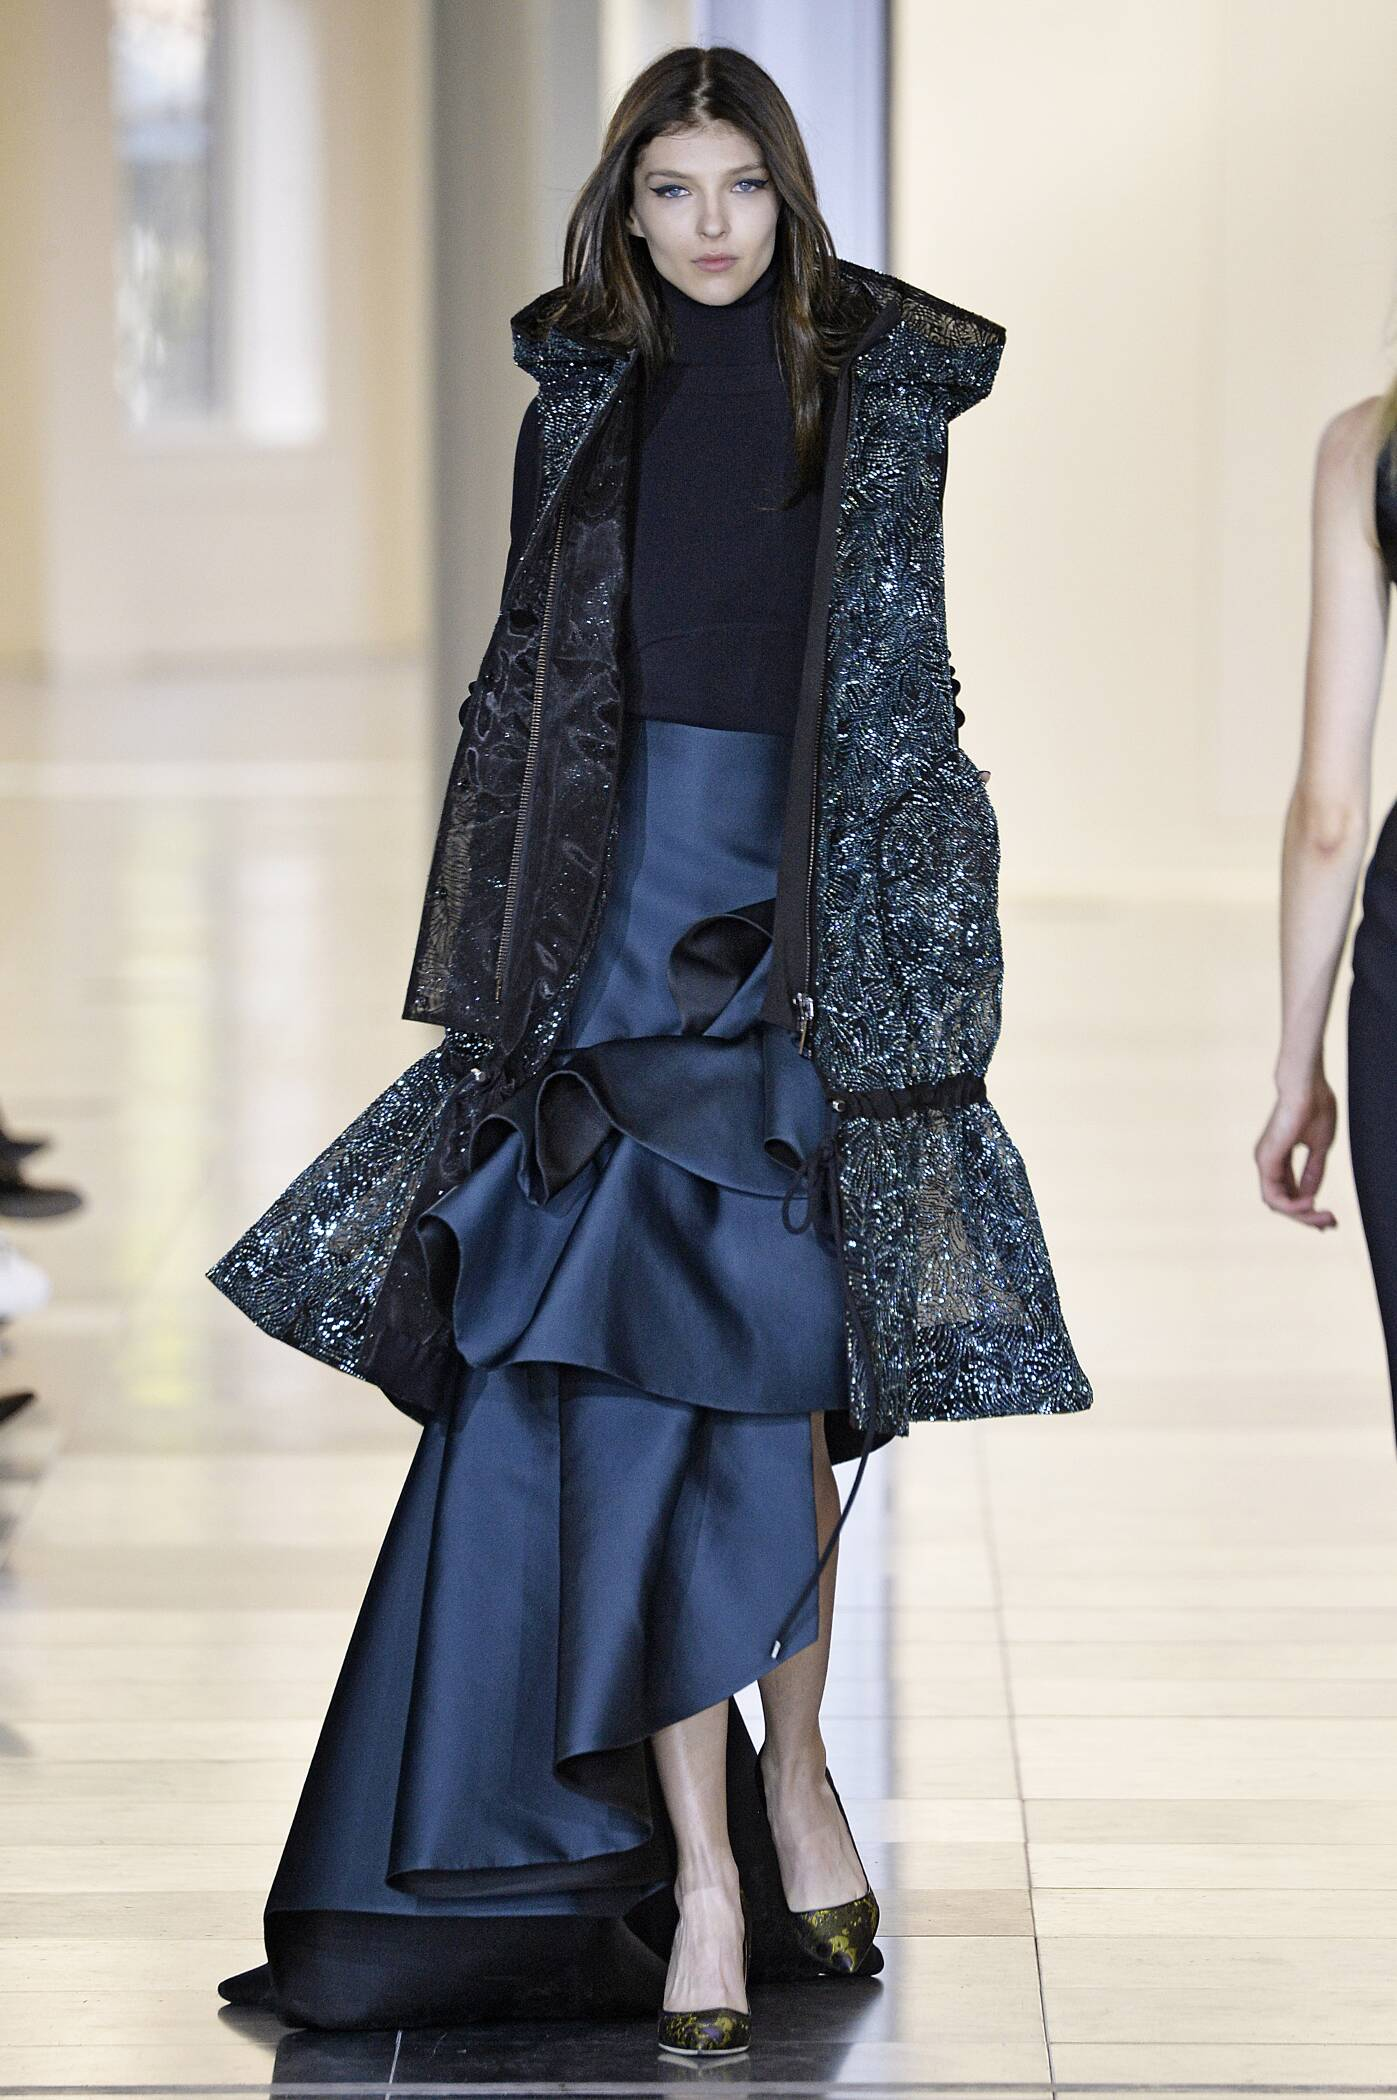 Antonio Berardi Fall Winter 2015 16 Women's Collection London Fashion Week